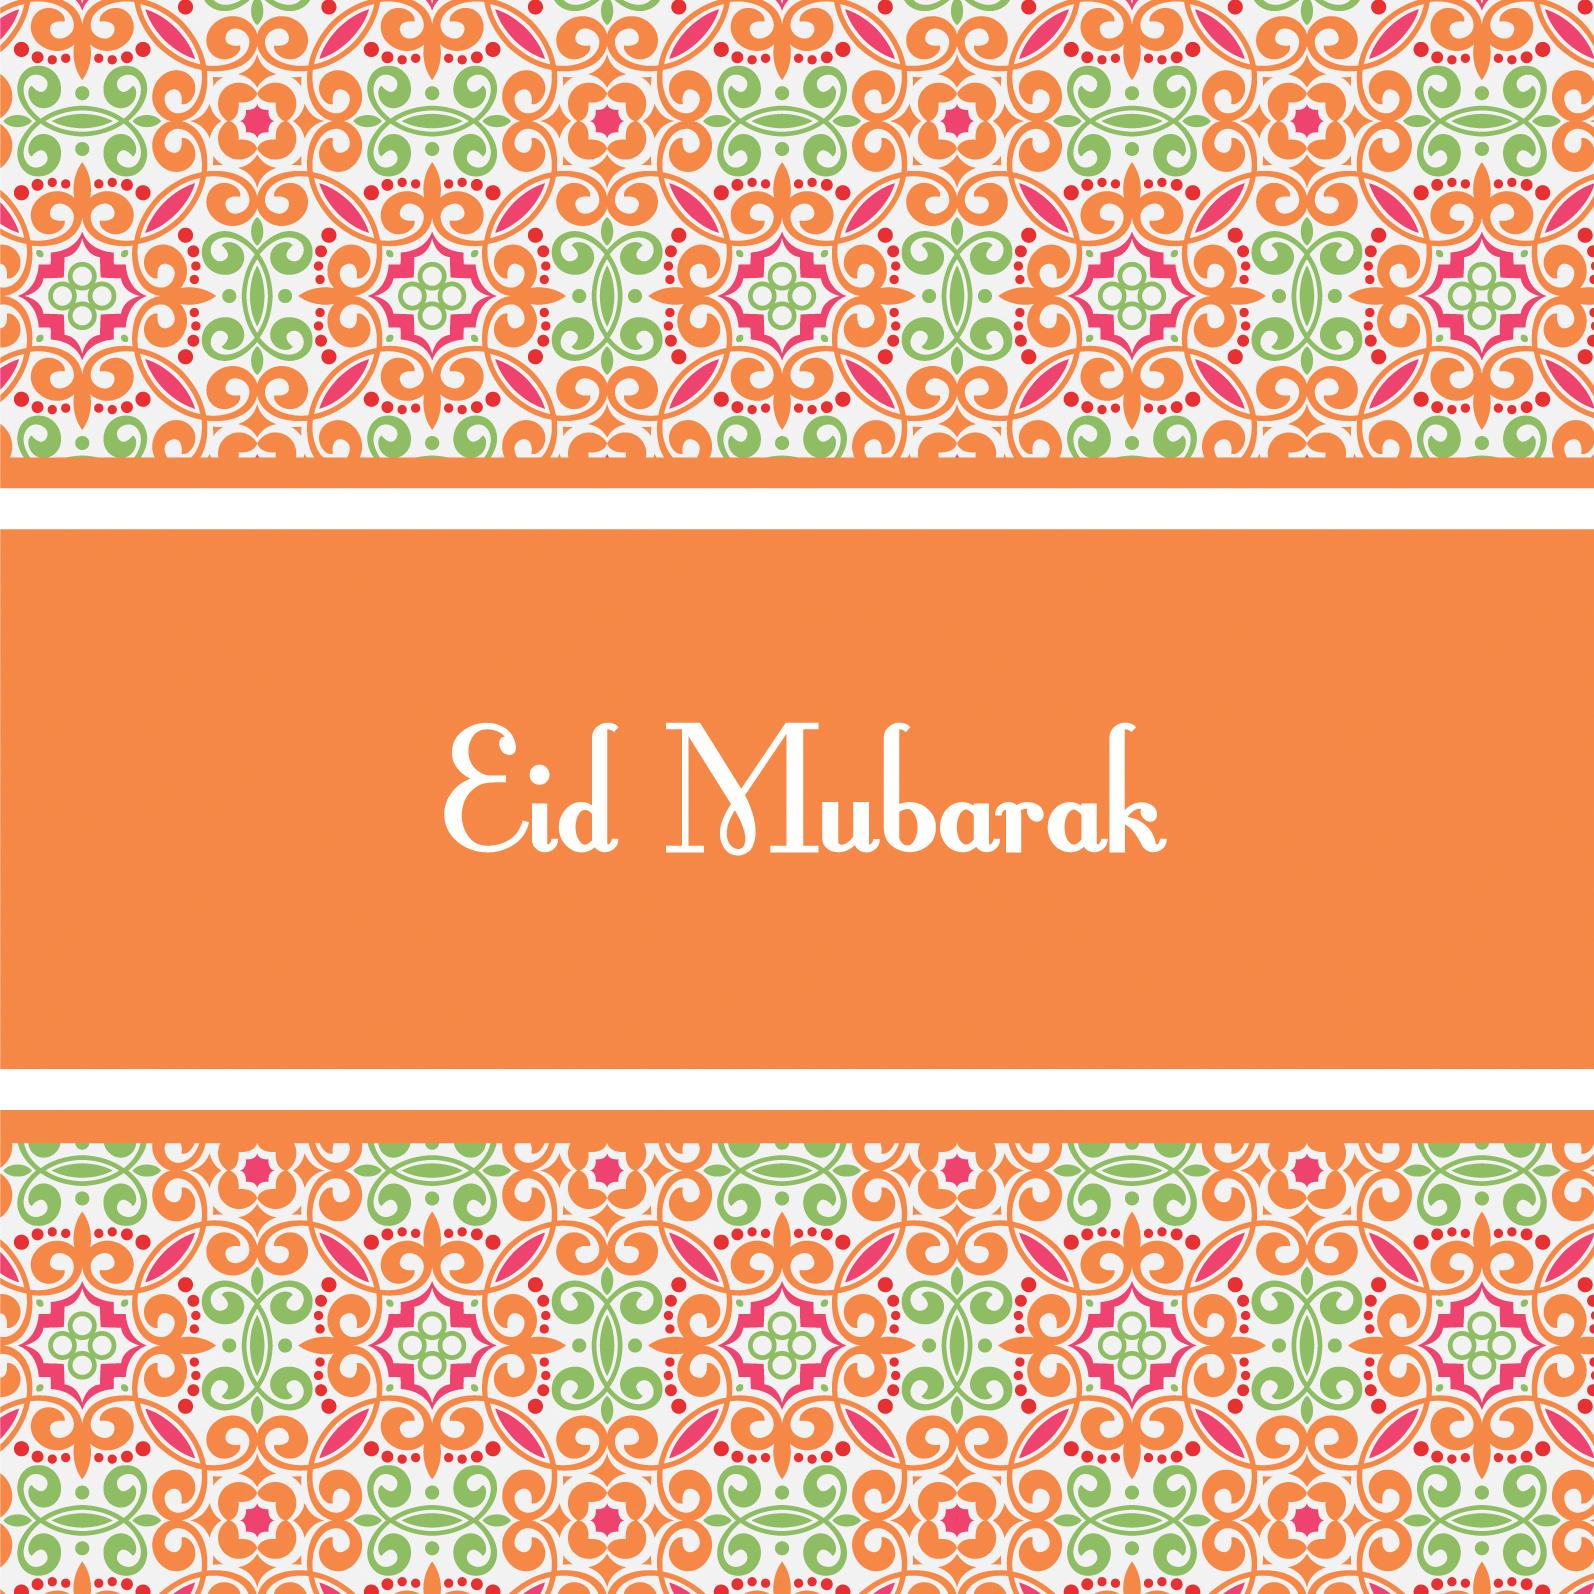 Eid greeting card, eid mubarak